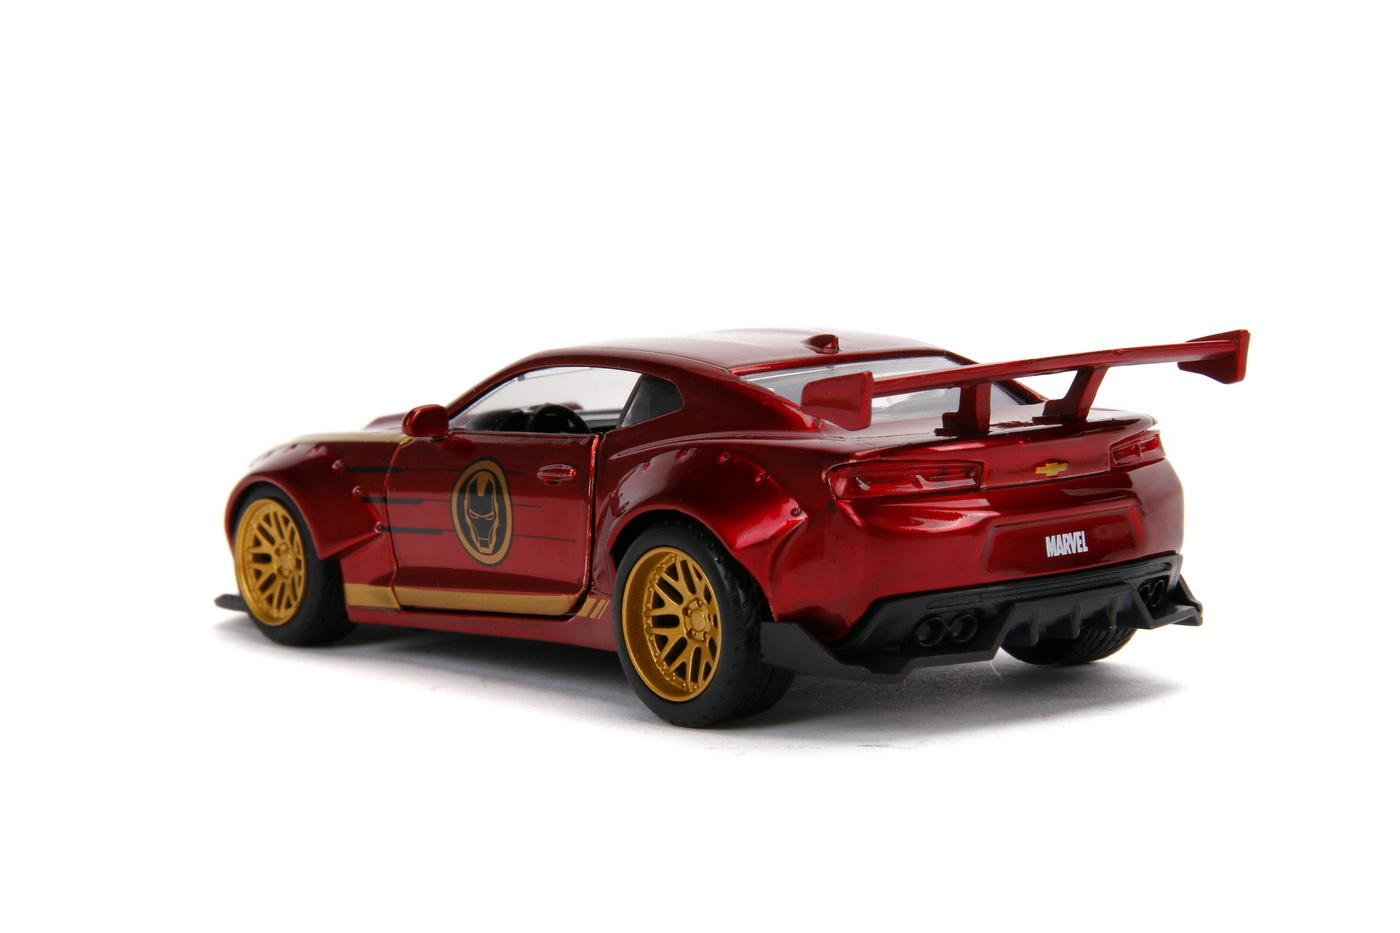 Masinuta Metalica Iron Man 2016 Chevy Camaro Ss Scara 1 La 32 | JadaToys - 7